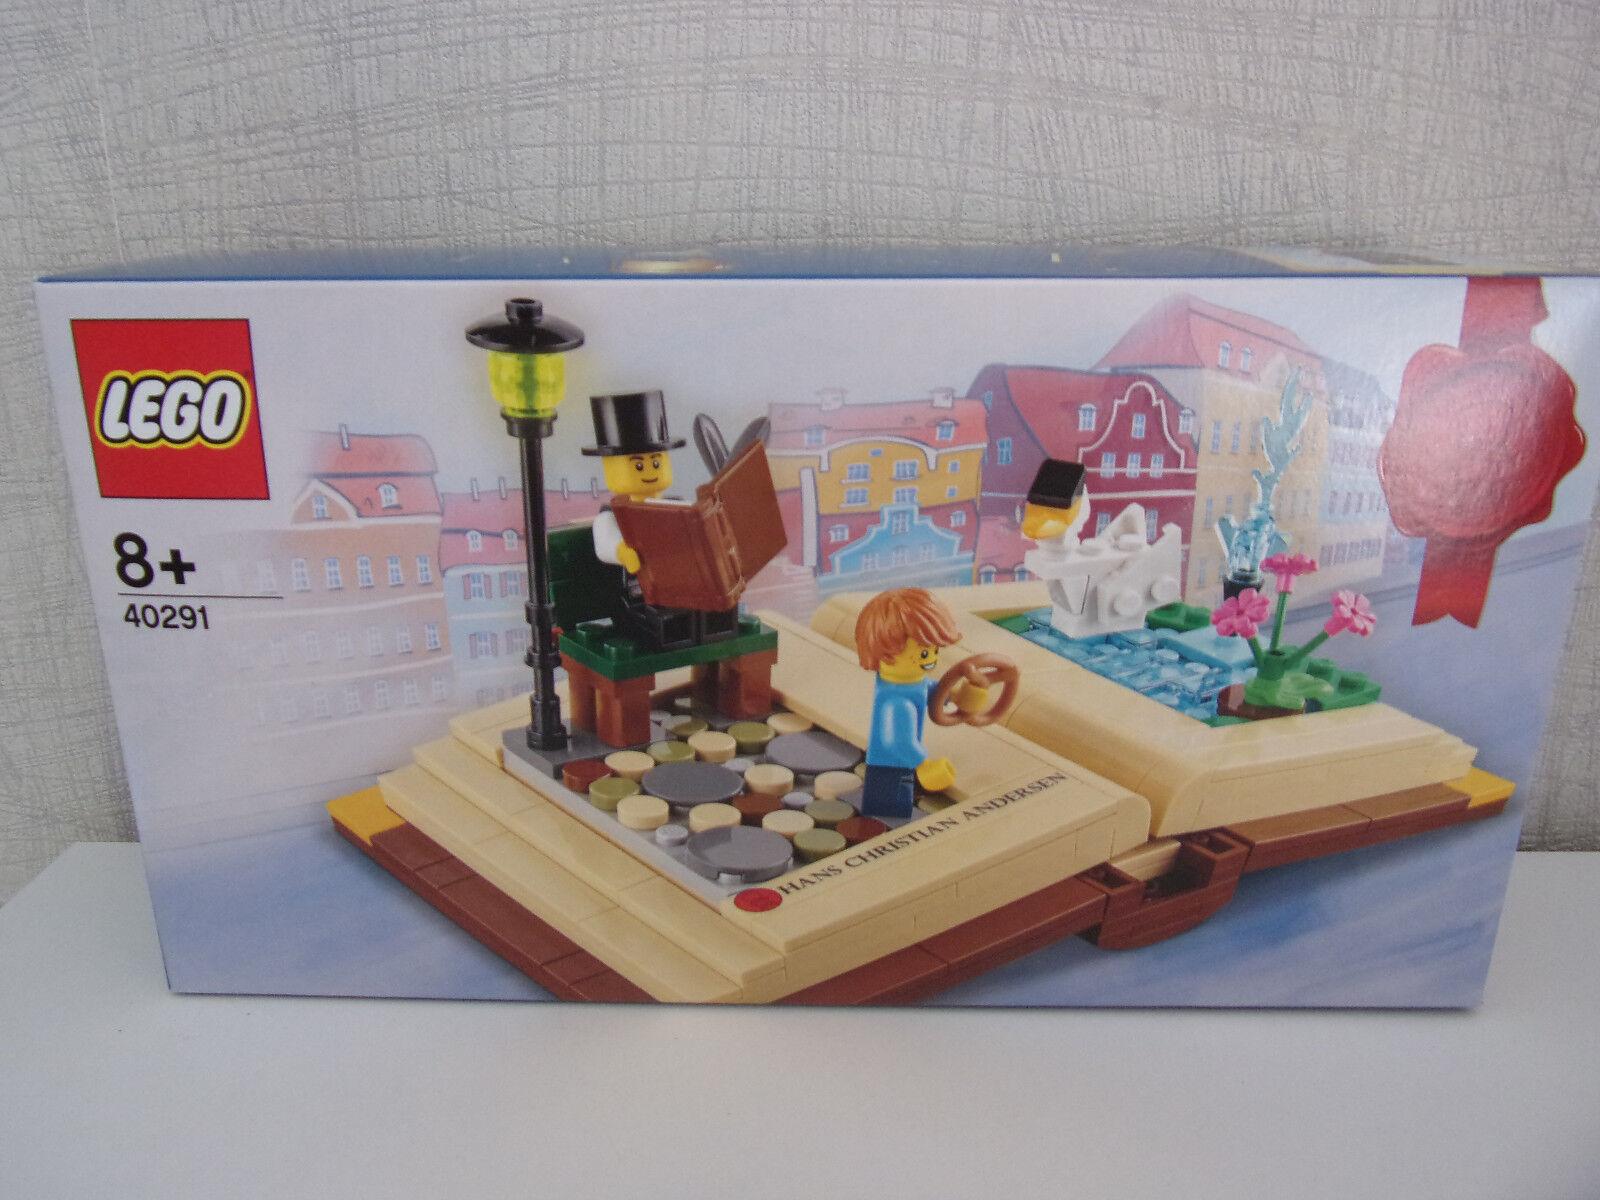 Lego 40291 Creative Storybook Hans Christian Andersen - Neuf et Emballage